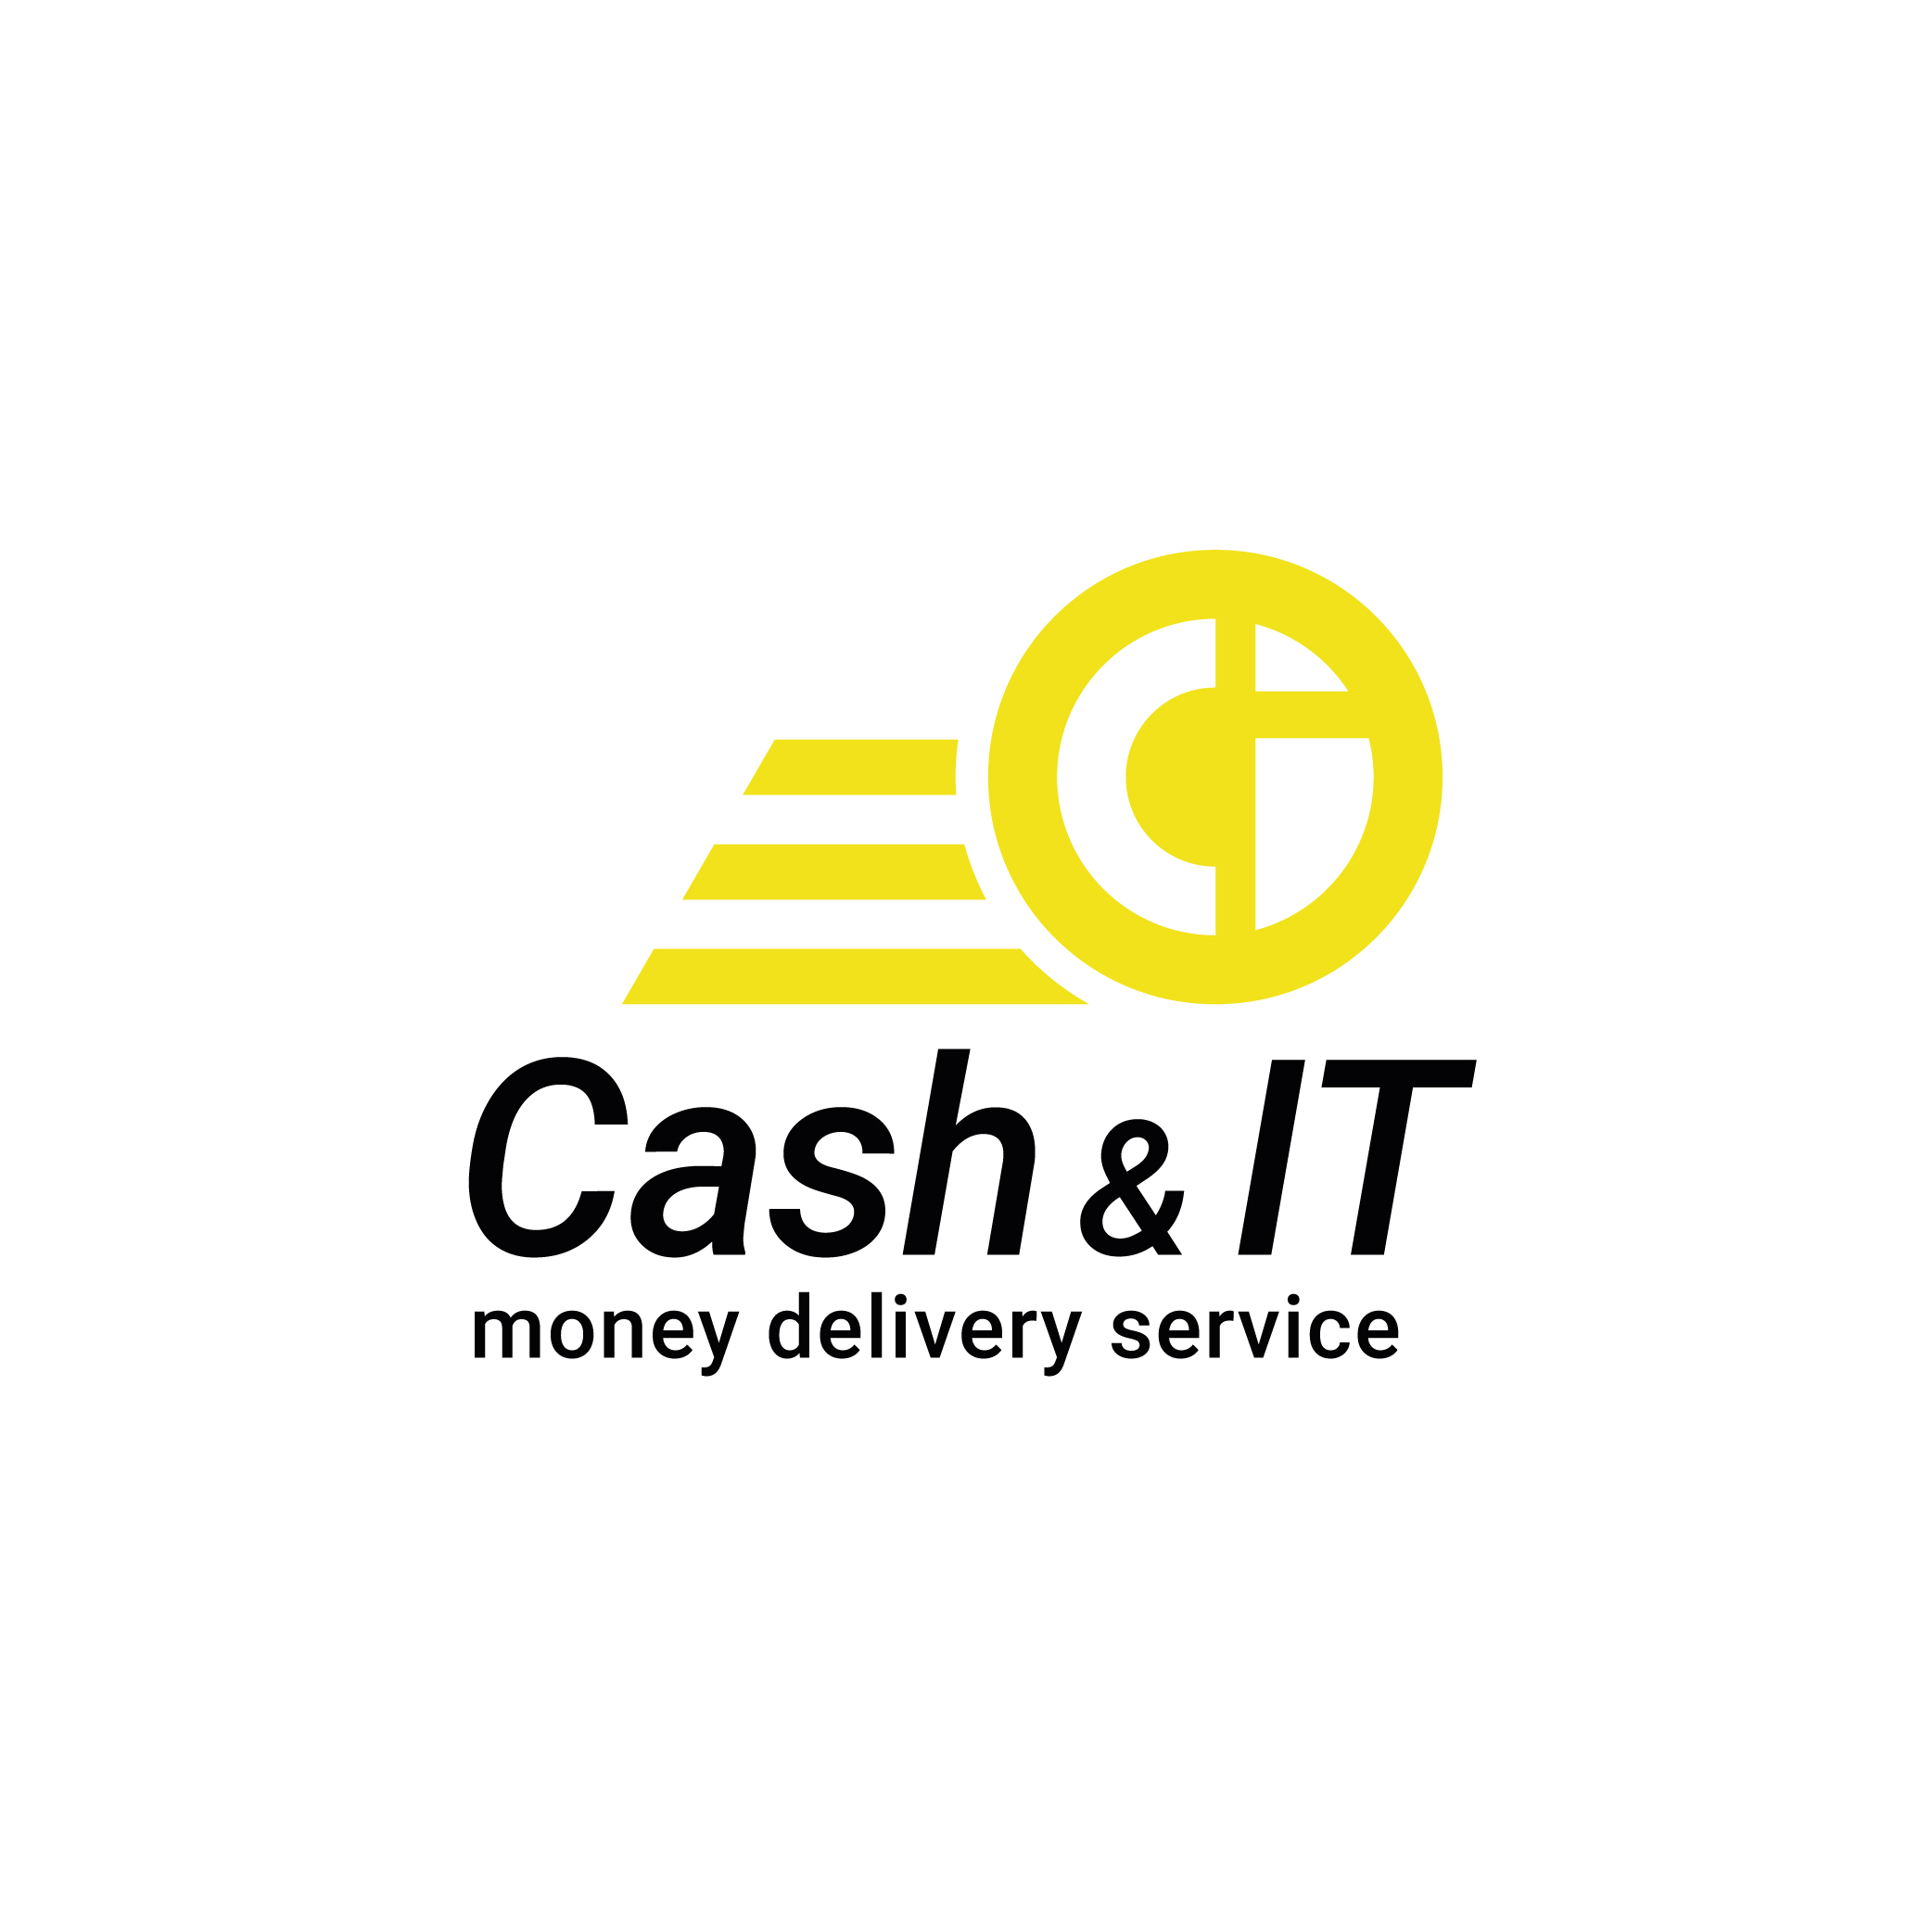 Логотип для Cash & IT - сервис доставки денег фото f_3445fe23ef27c778.jpg